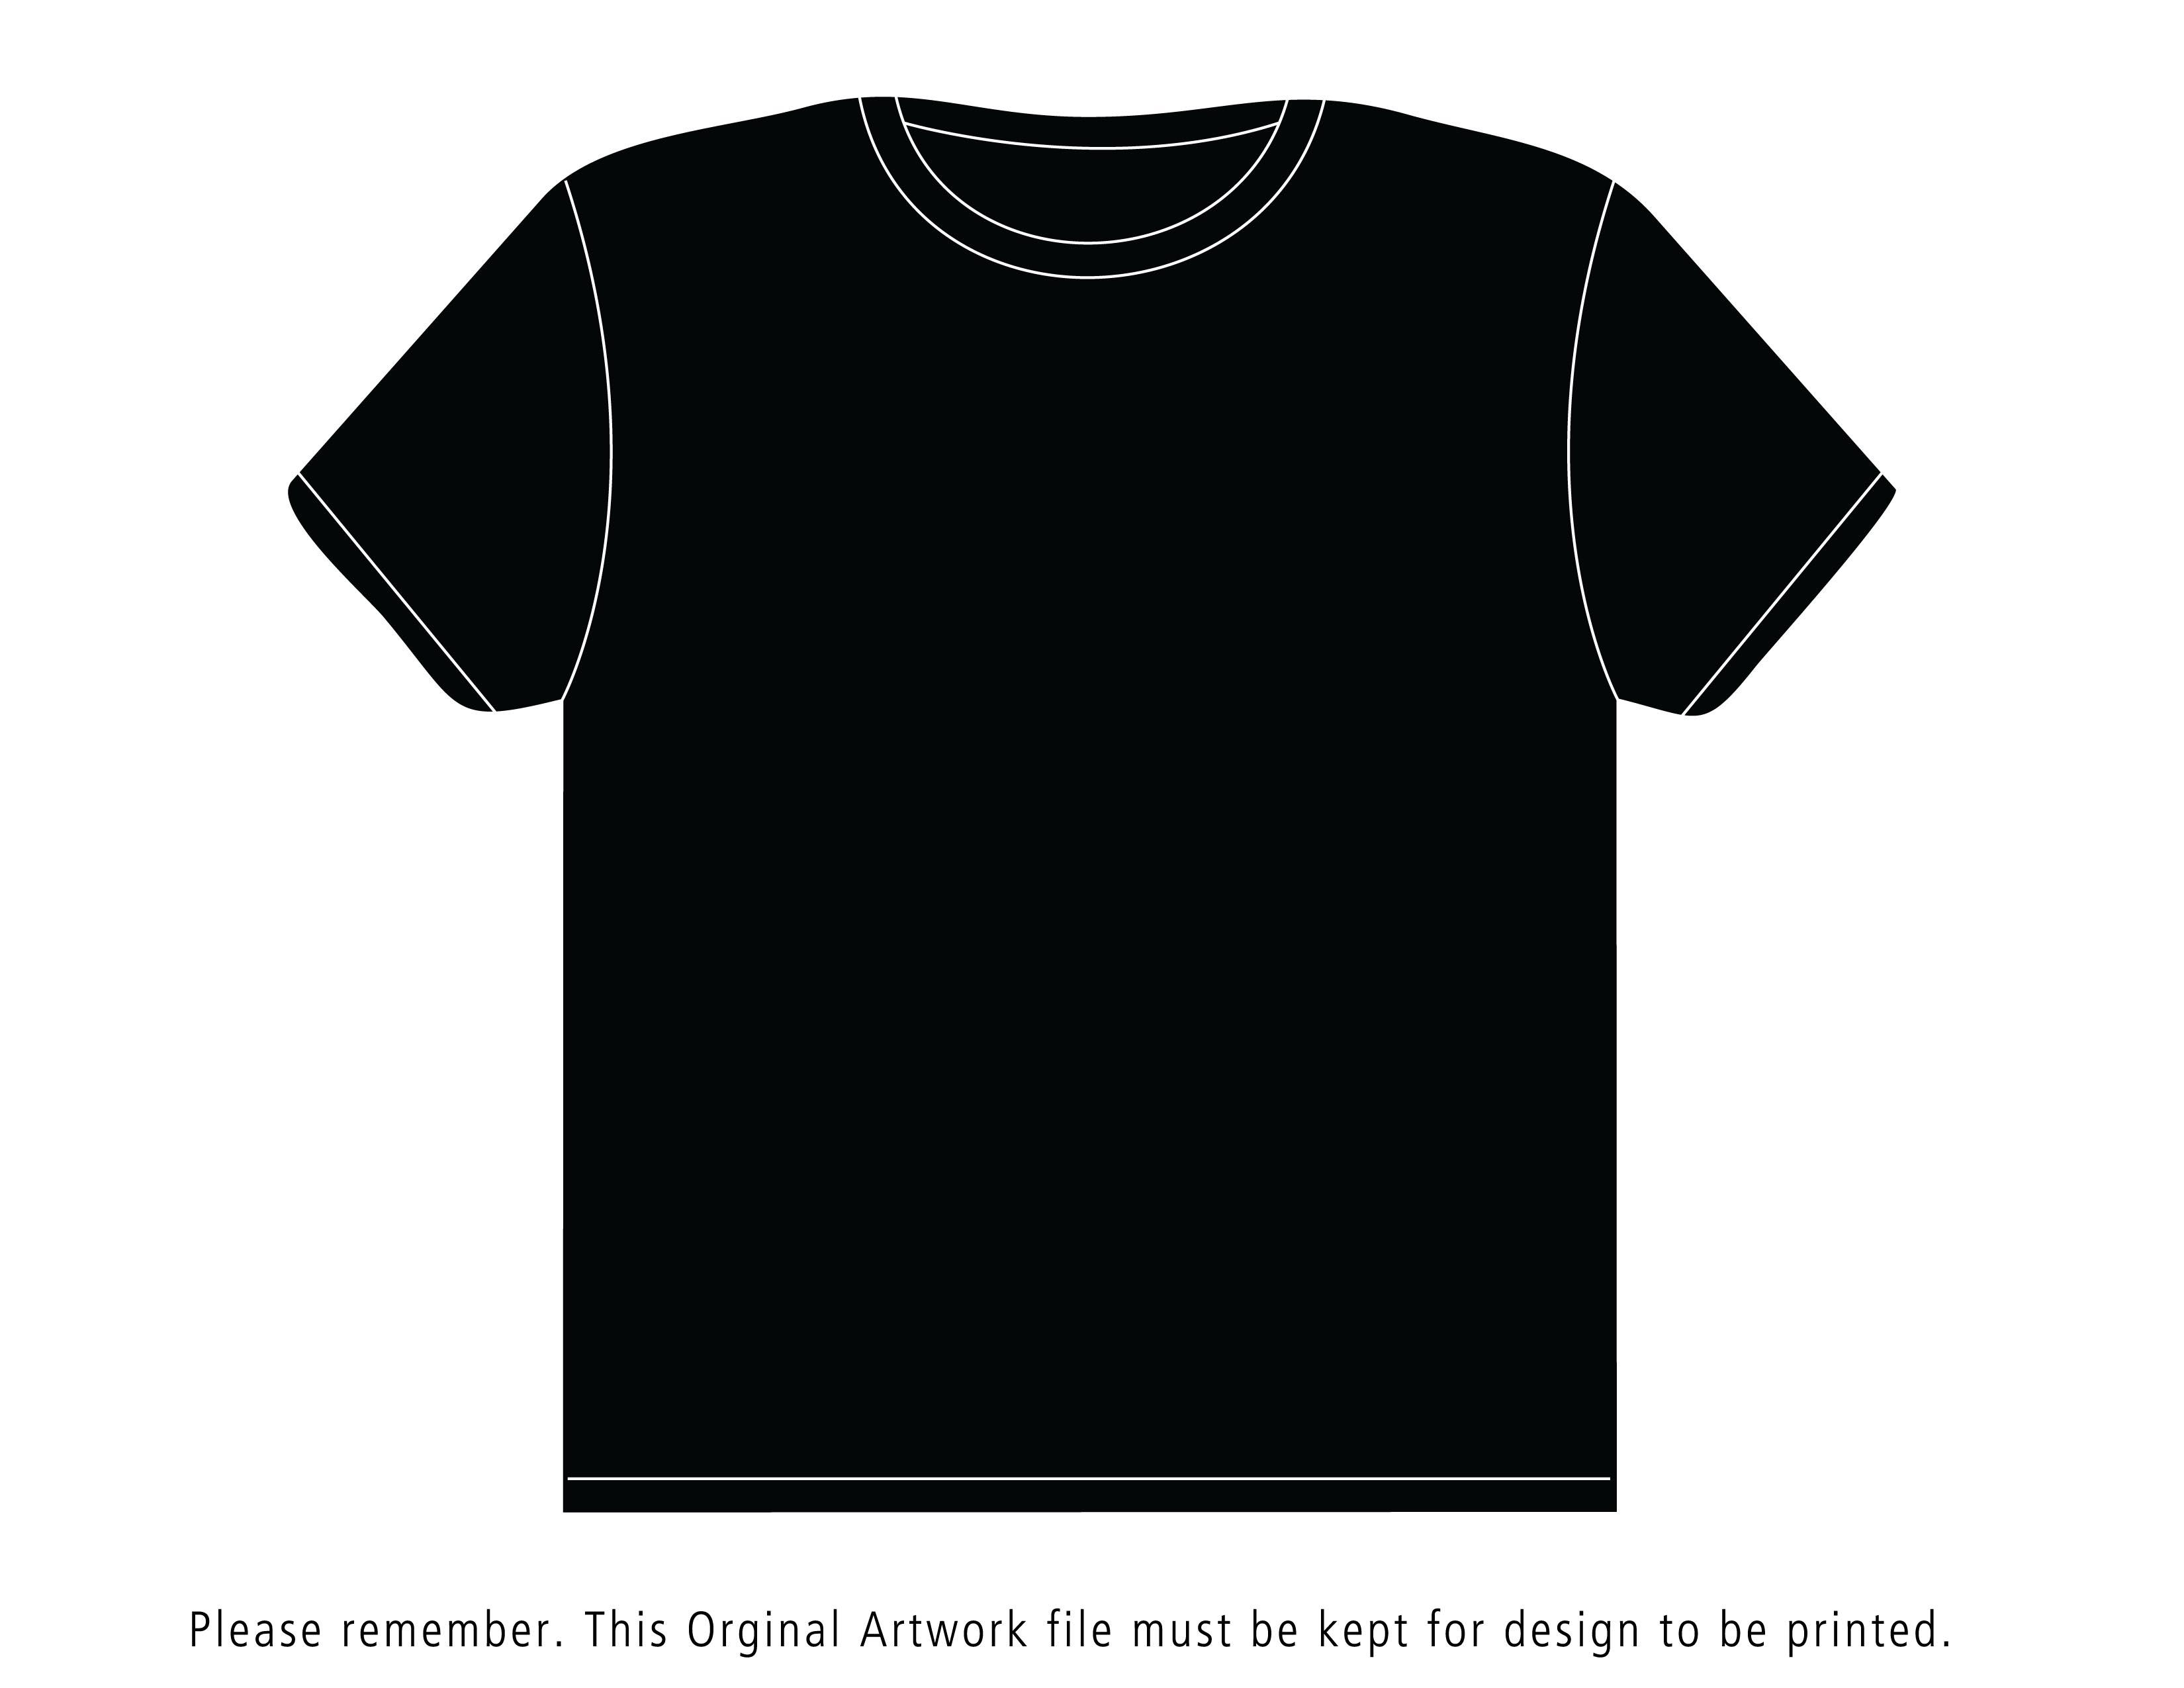 t shirt template clip art a clipart panda free clipart images rh clipartpanda com